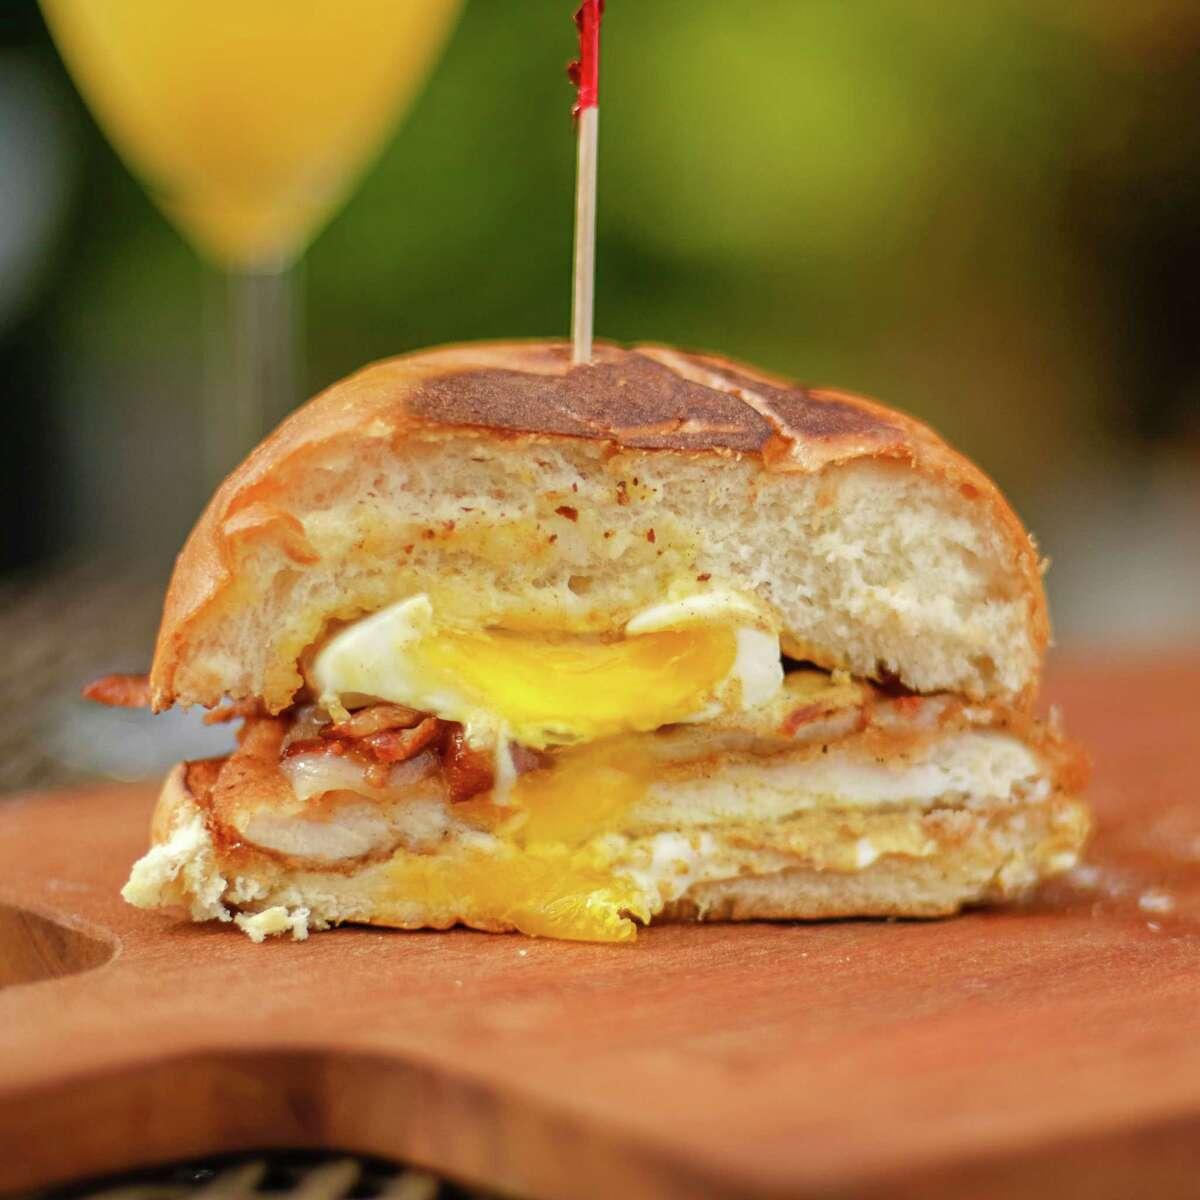 King's BierHaus, 2044 E. T.C. Jester, will start serving Sunday brunch on March 11. Shown: Handover Sandwich.